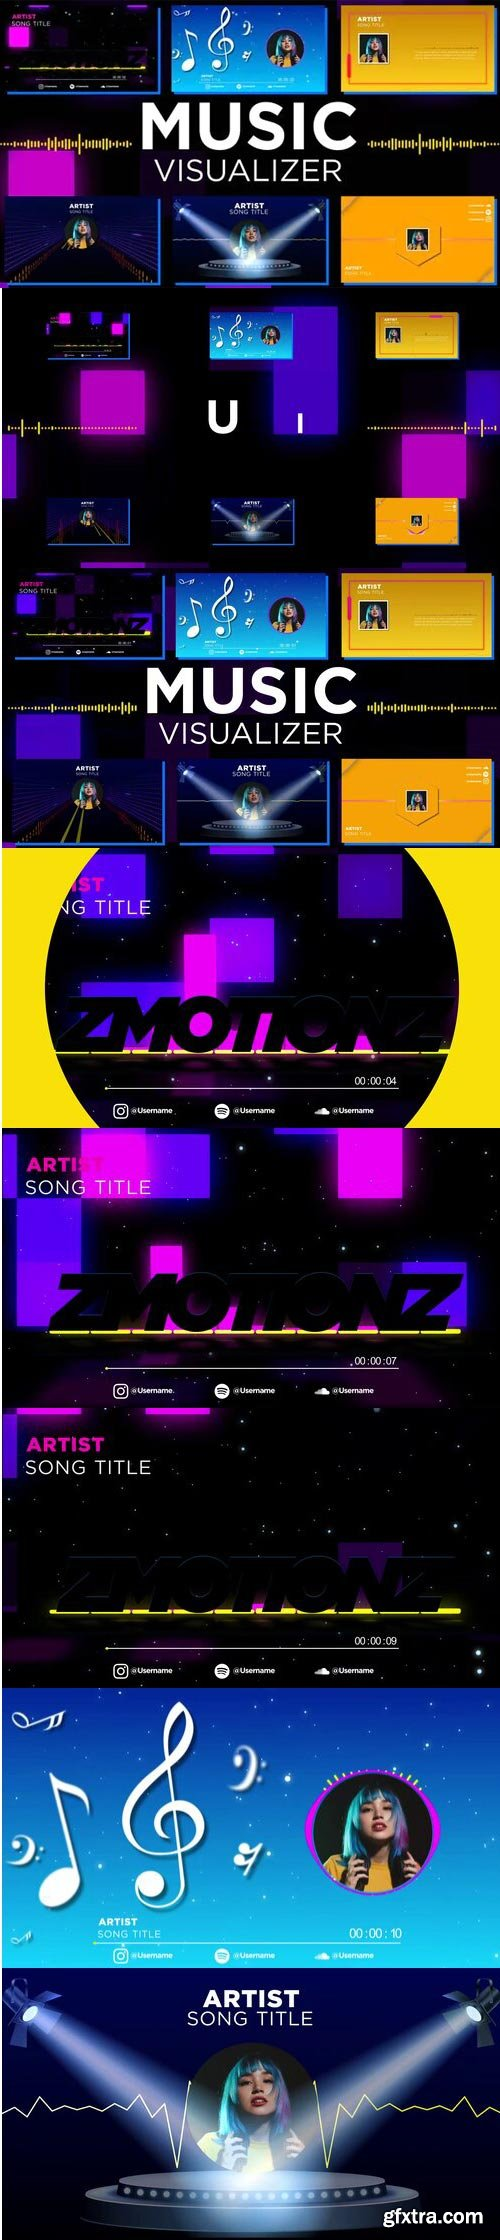 Videohive - Music Visualizer Pack - 33196162